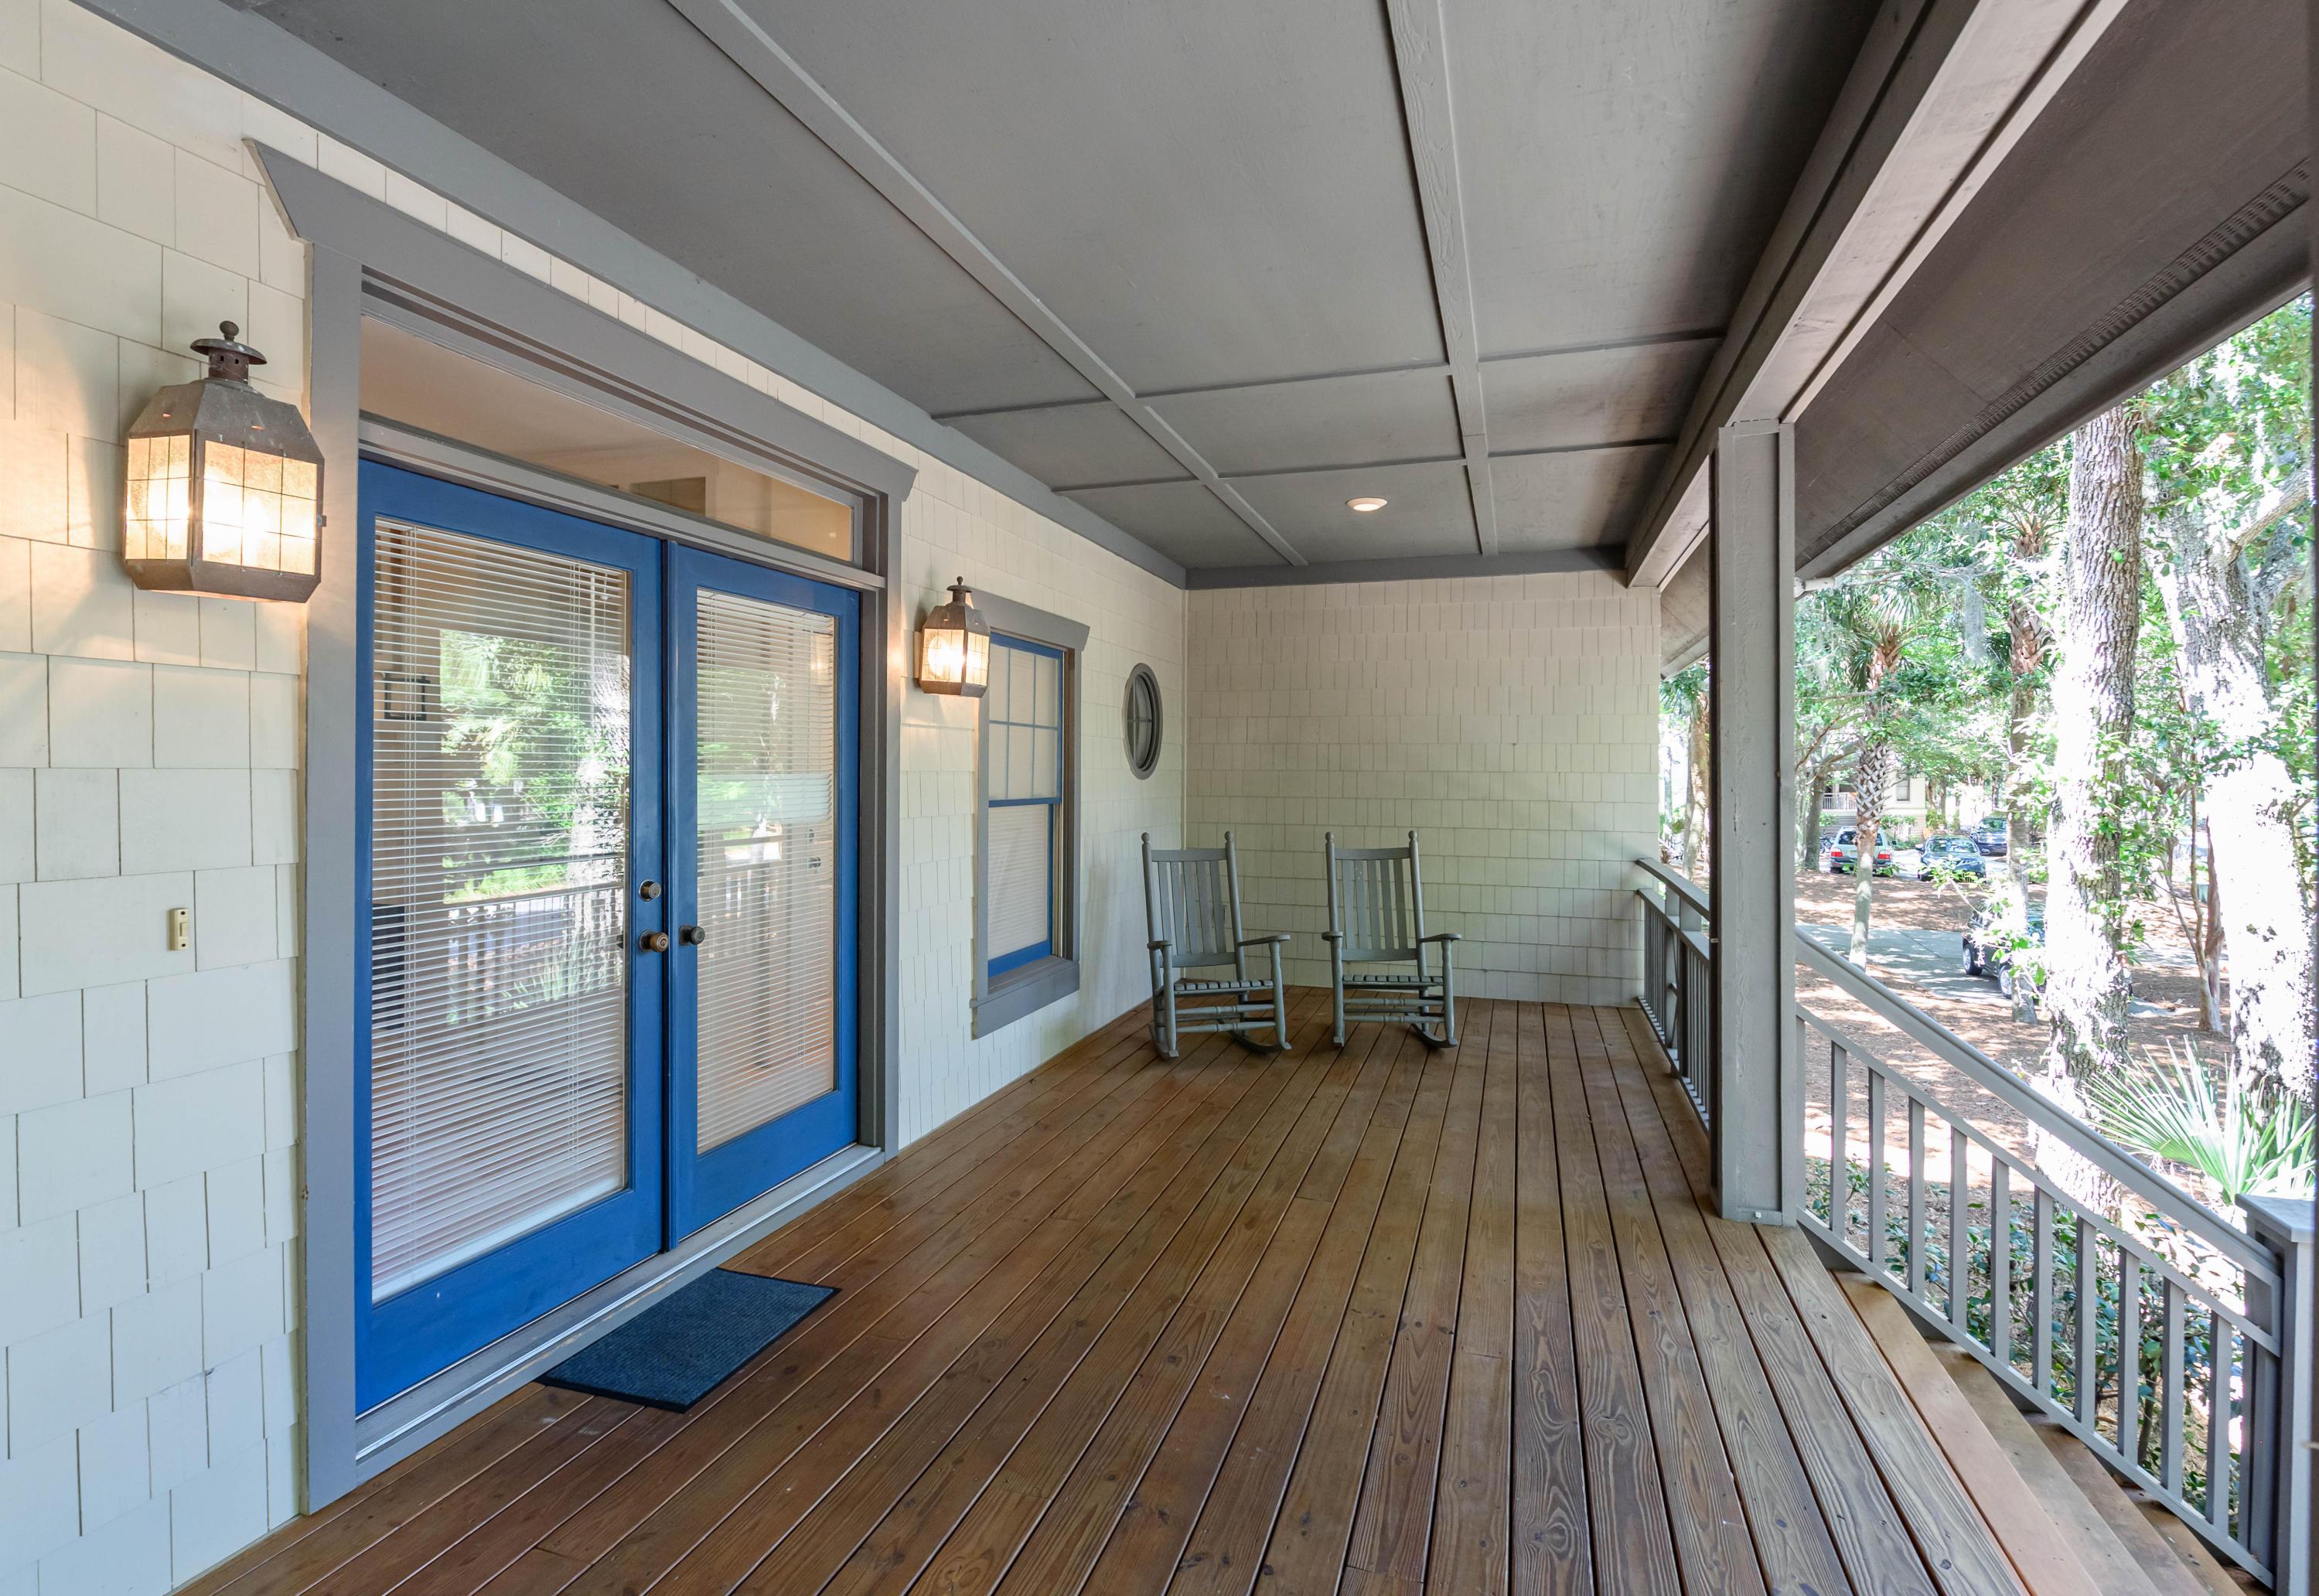 Kiawah Island Homes For Sale - 5 Ocean Green, Kiawah Island, SC - 36